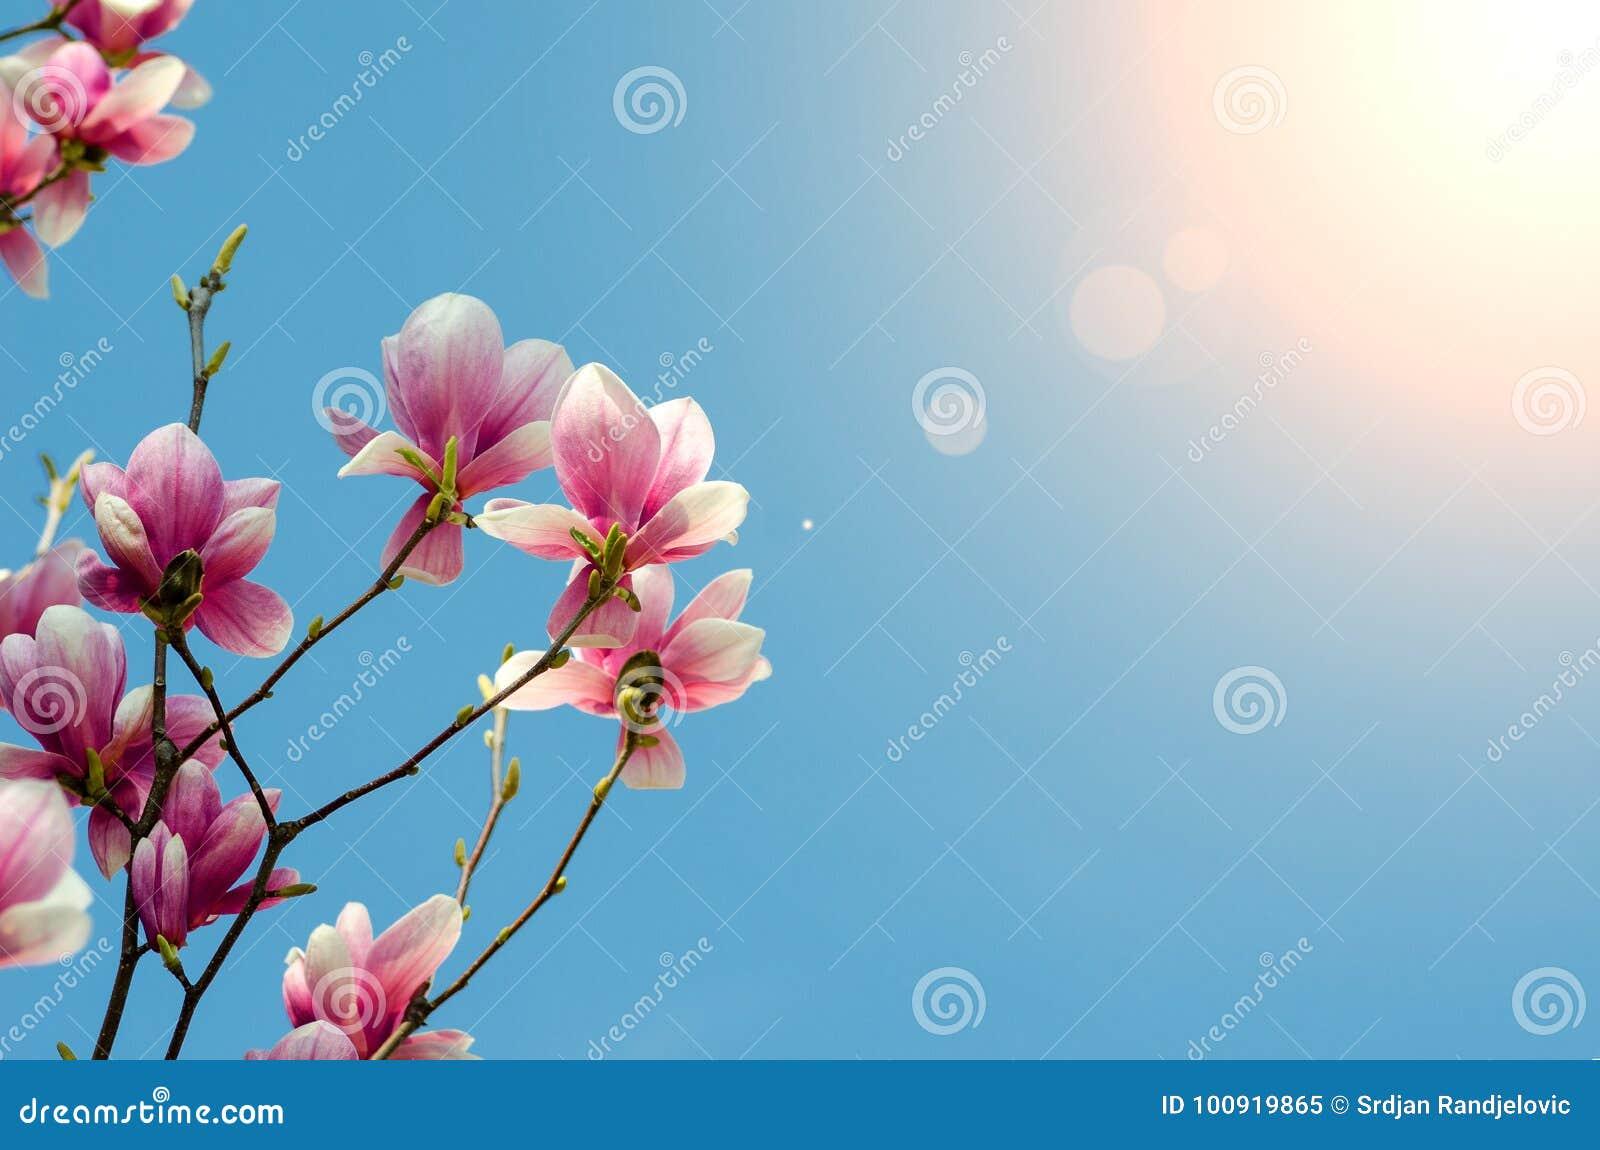 Beautiful purple magnolia flowers blossom in the spring season on download beautiful purple magnolia flowers blossom in the spring season on the tree with blue sky izmirmasajfo